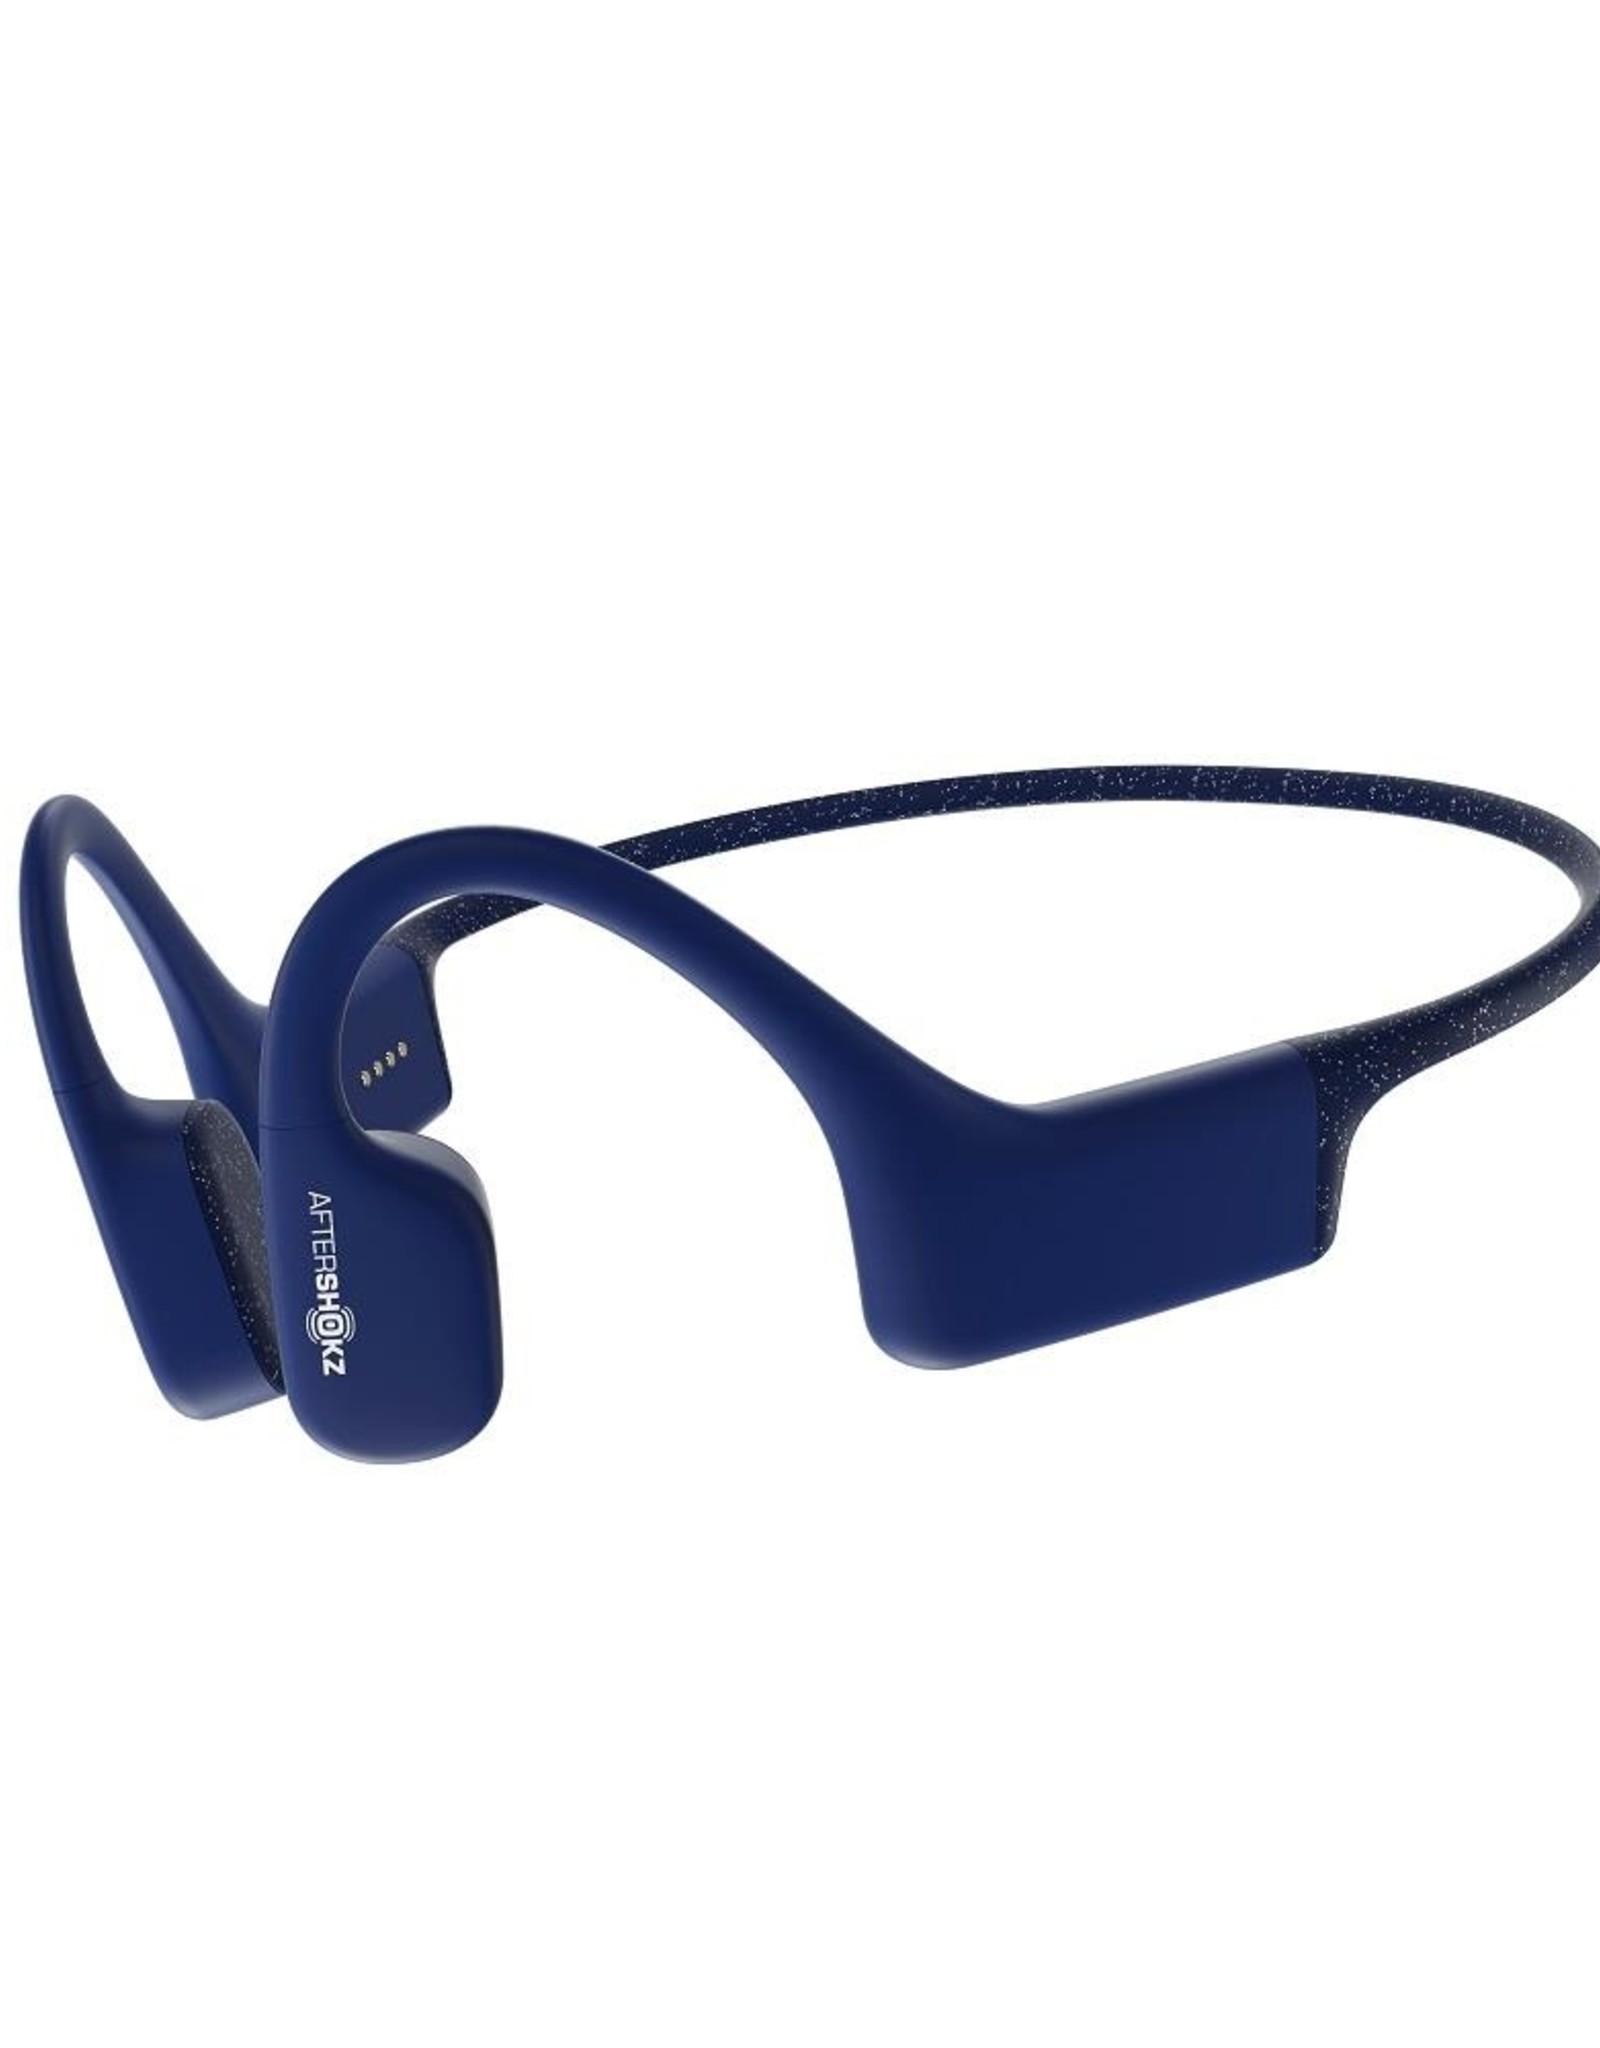 Aftershokz Afterhokz | XTRAINERZ HEADPHONE WATERPROOF MP3 SAPPHIRE BLUE AS700SB